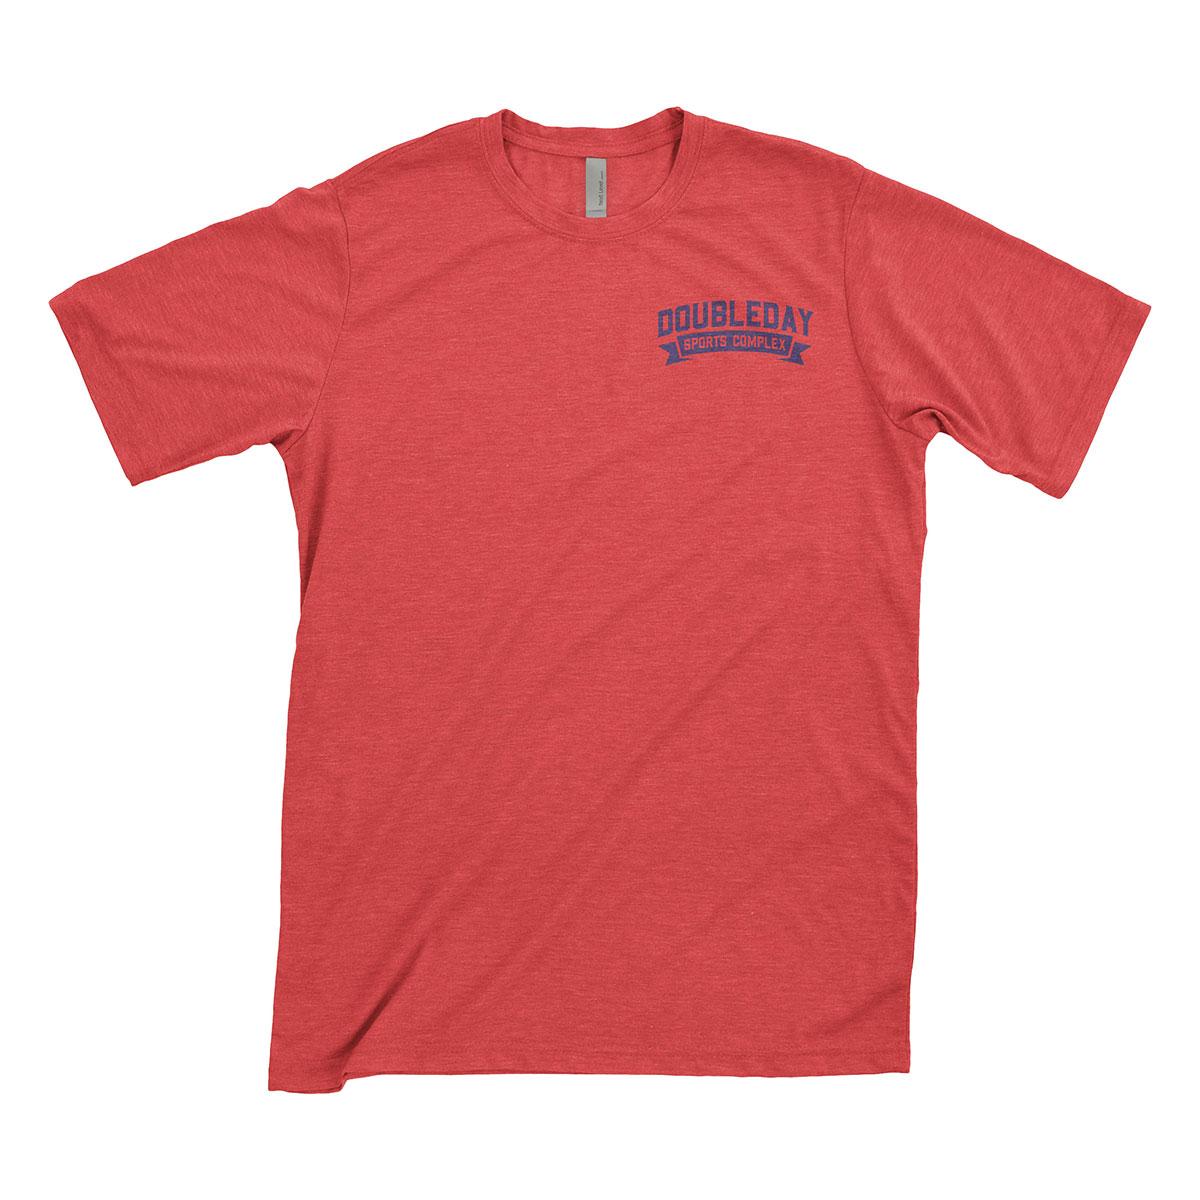 Doubleday Sports Complex T-shirt design